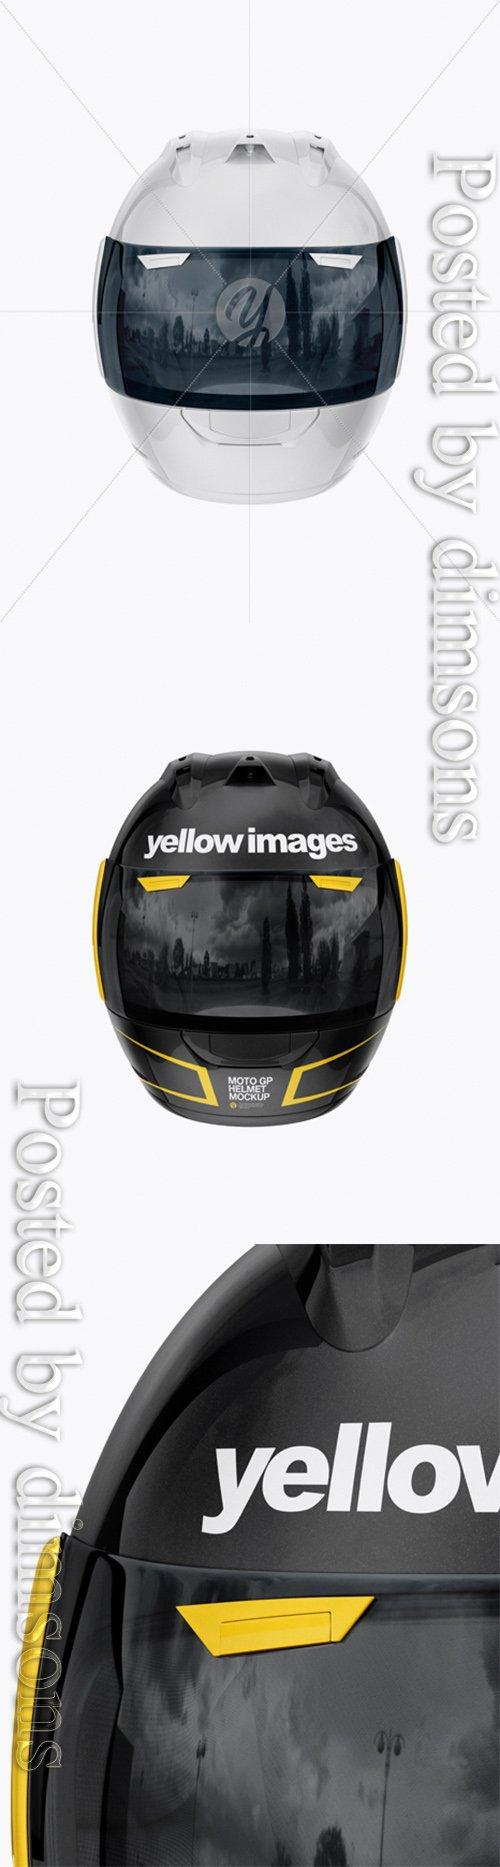 Moto GP Helmet Mockup - Front View 24958 TIF